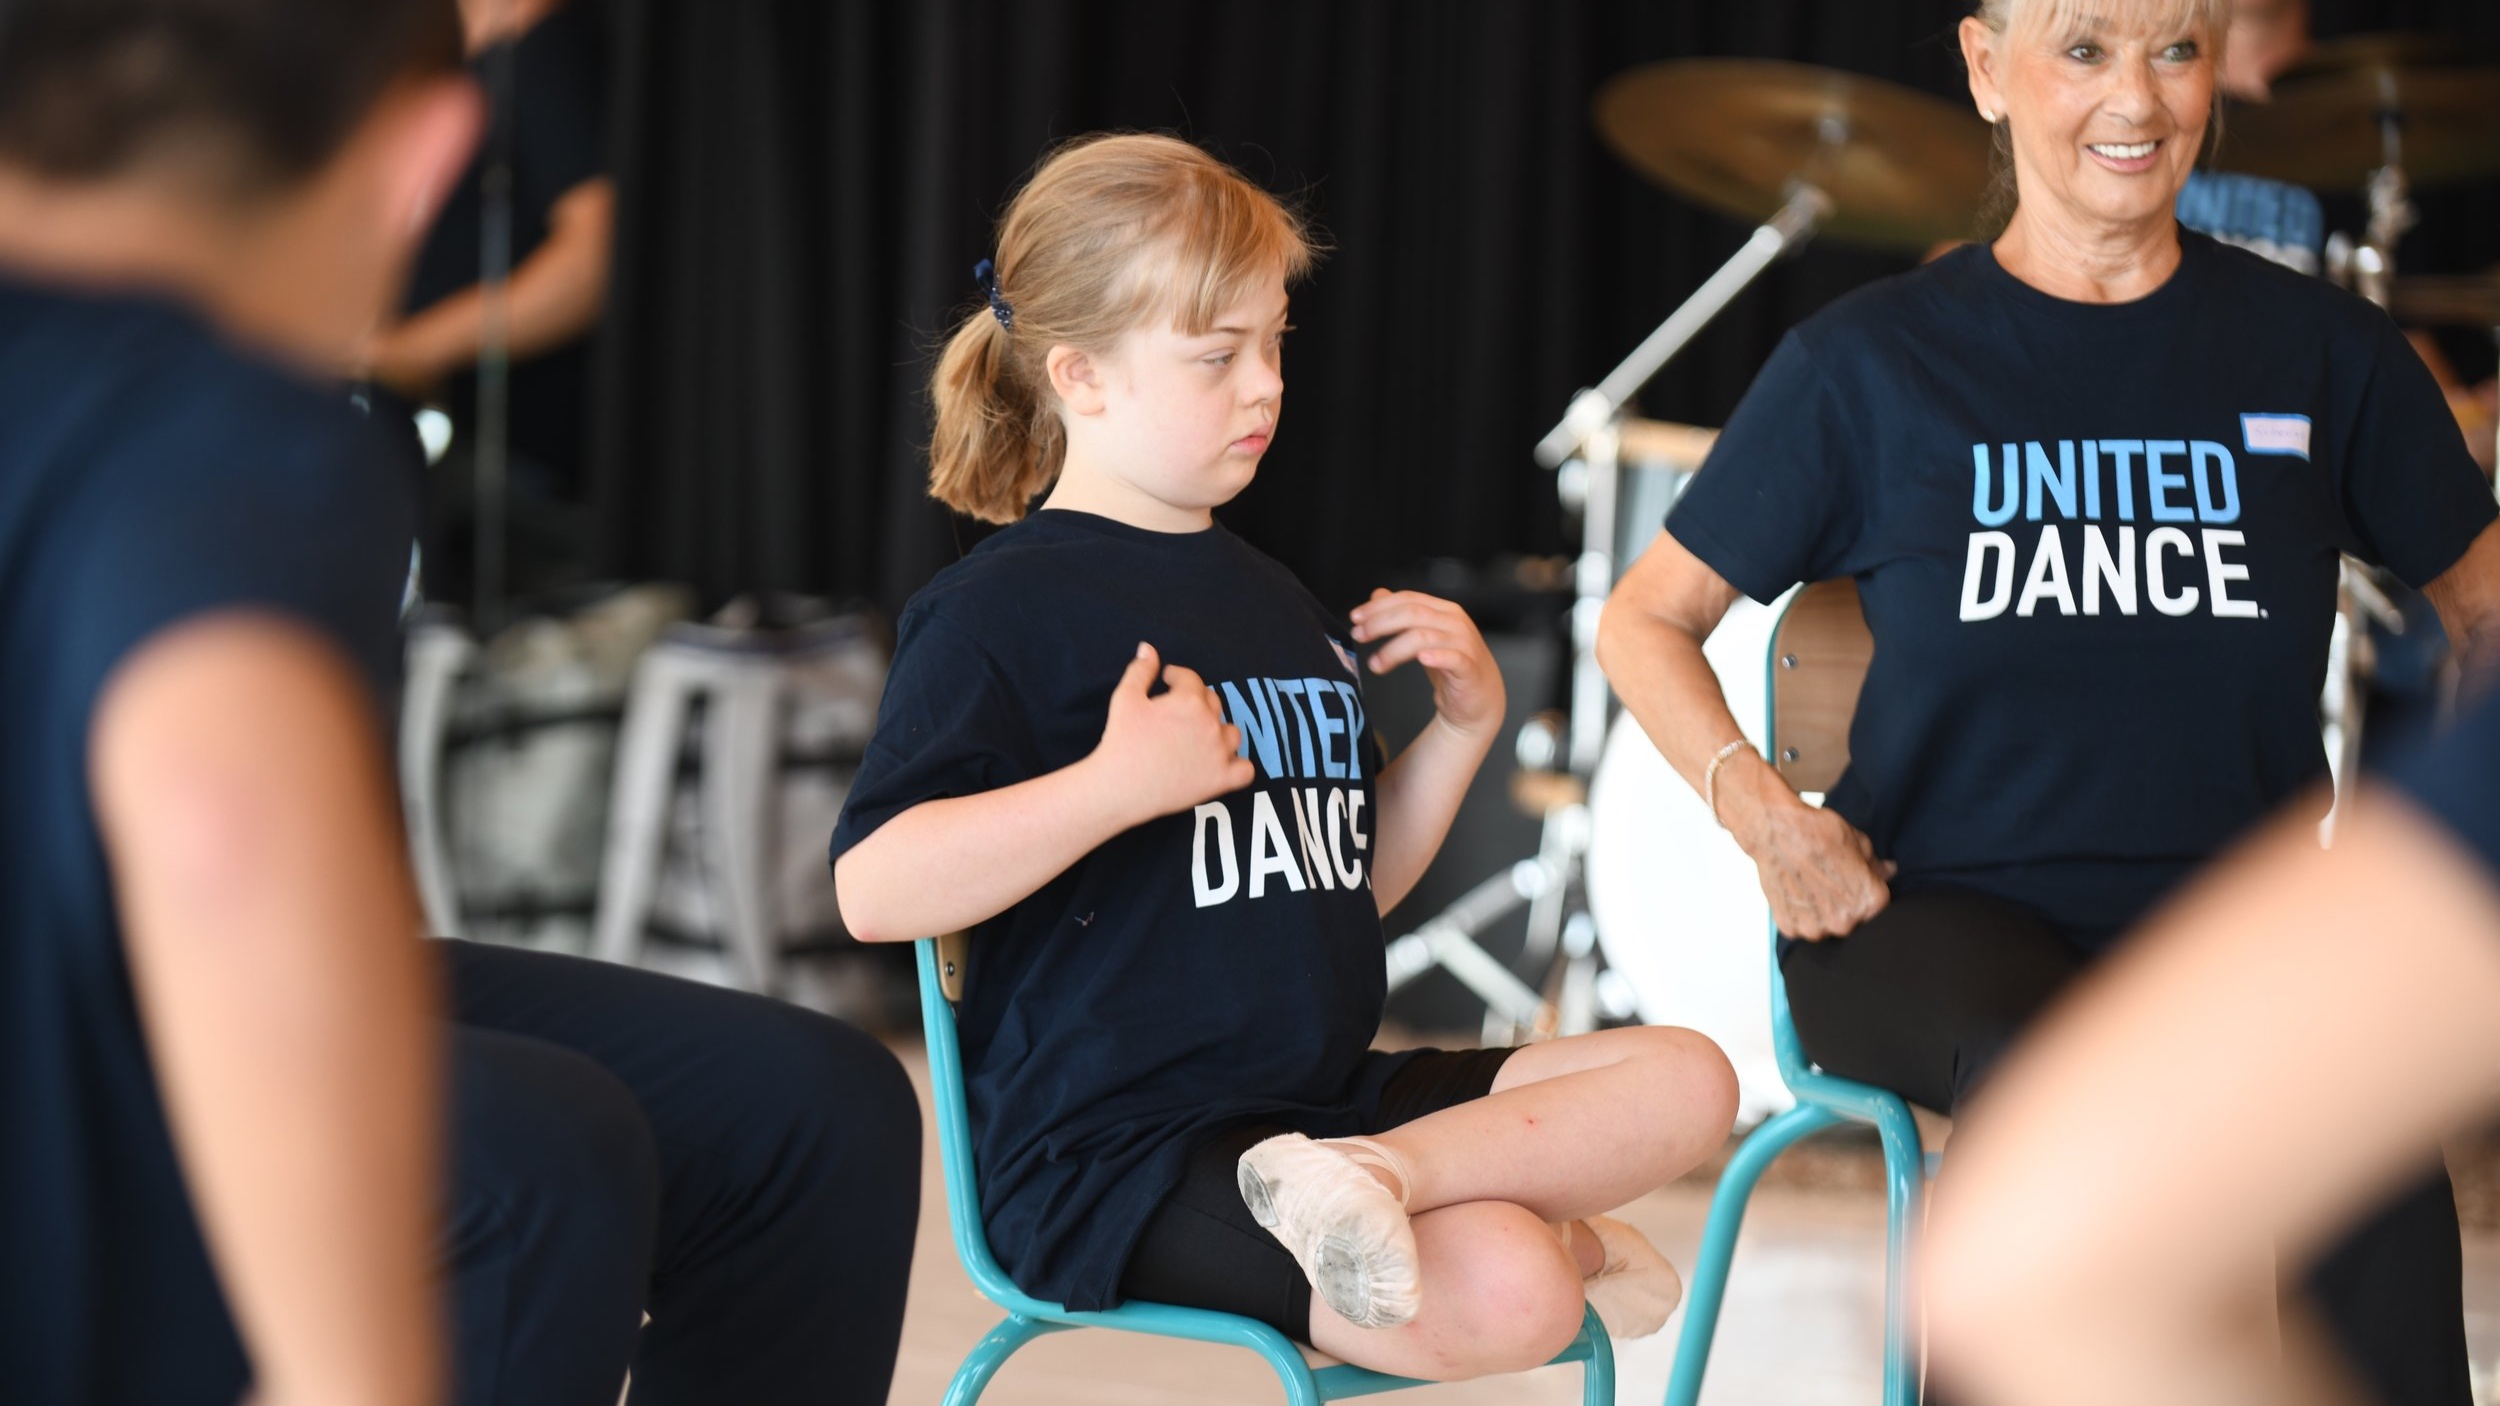 Genval, Belgium - Dance Center La Papeterie, 8 - 13 July 2019Information - Registration